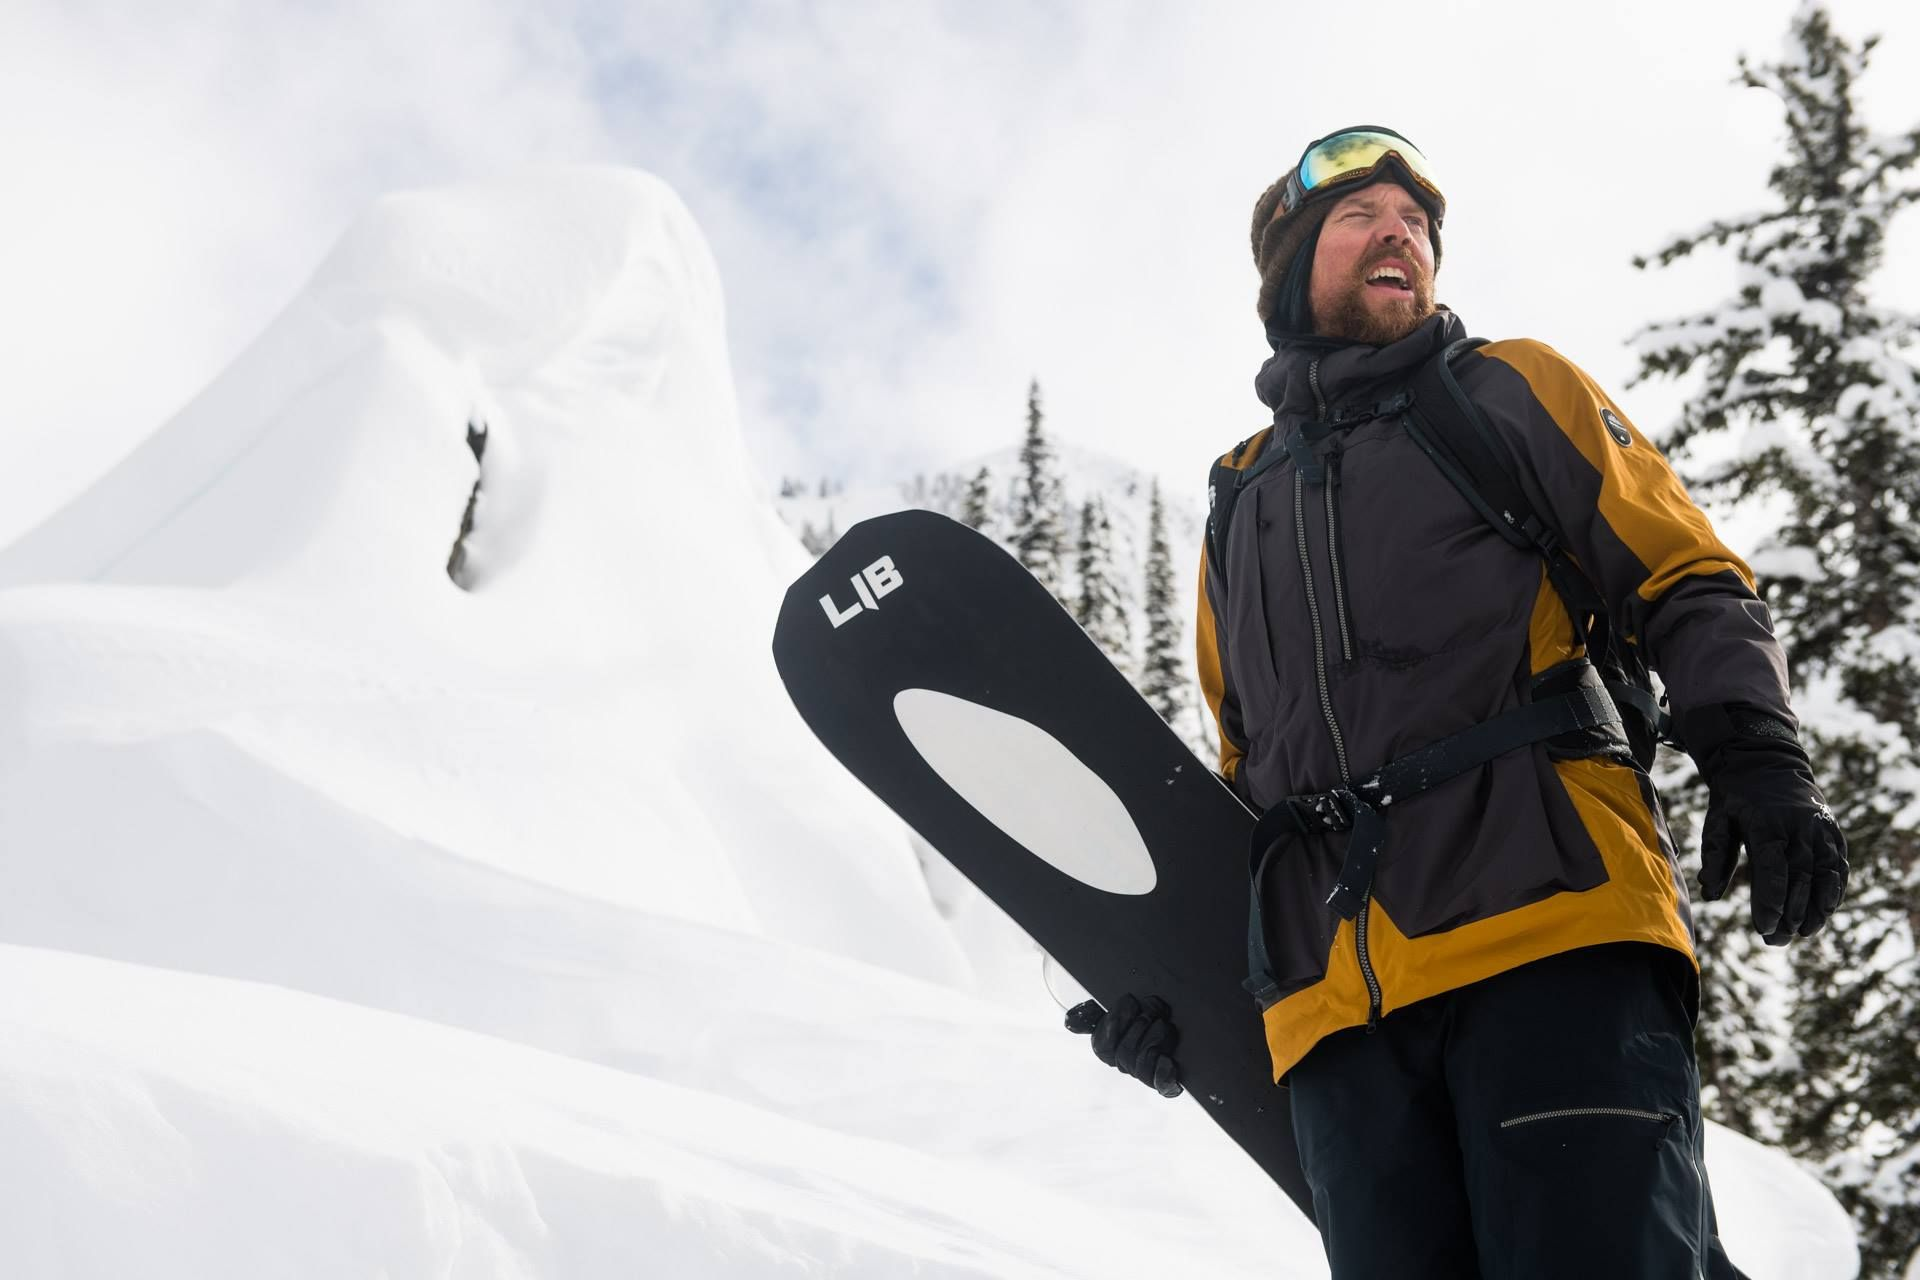 Pin By Adam On Snowboard In 2020 Travis Rice Snowboard Snowboarding Gear